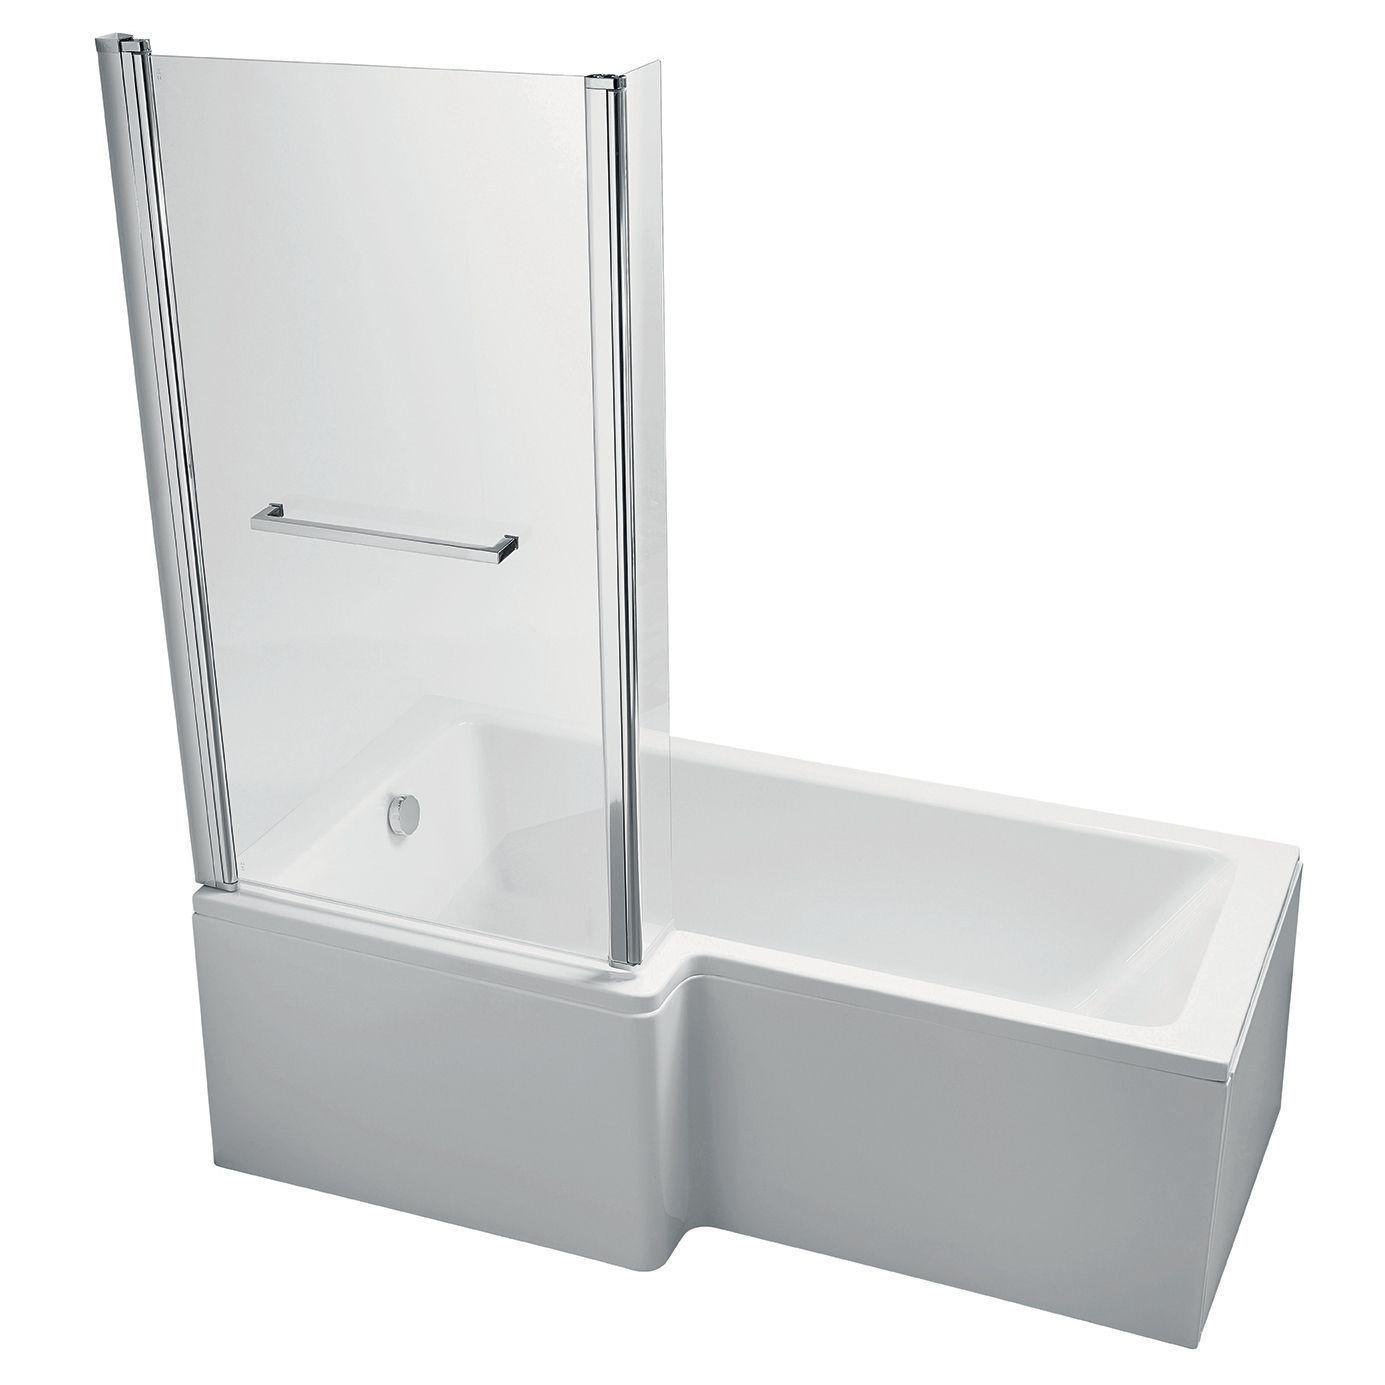 ideal standard imagine lh acrylic rectangular shower bath front ideal standard imagine lh acrylic rectangular shower bath front panel screen l 1695mm w 1695mm departments diy at b q